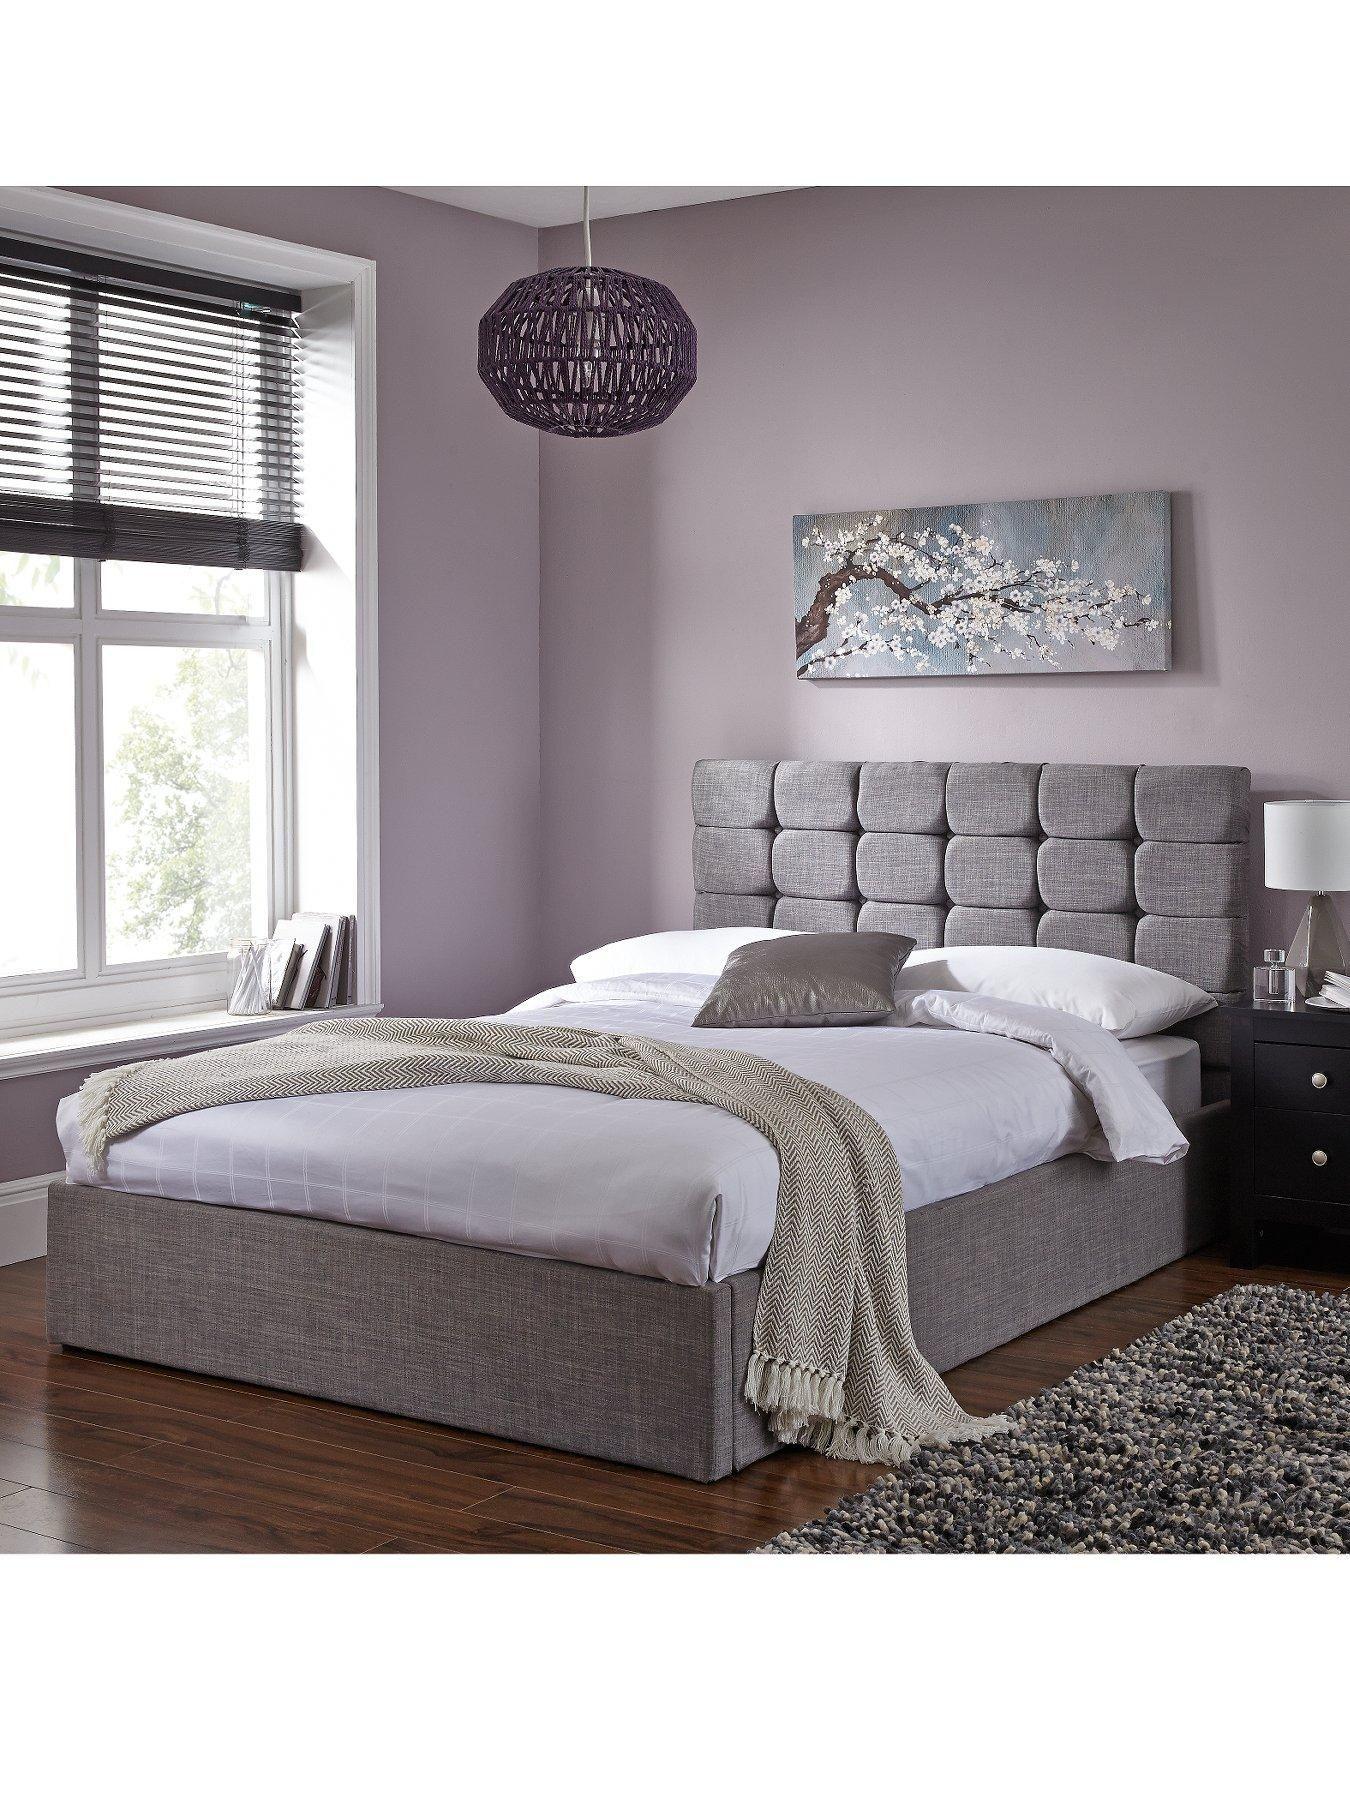 Littlewoods Ireland  Online Shopping  Fashion & Homeware  Bed